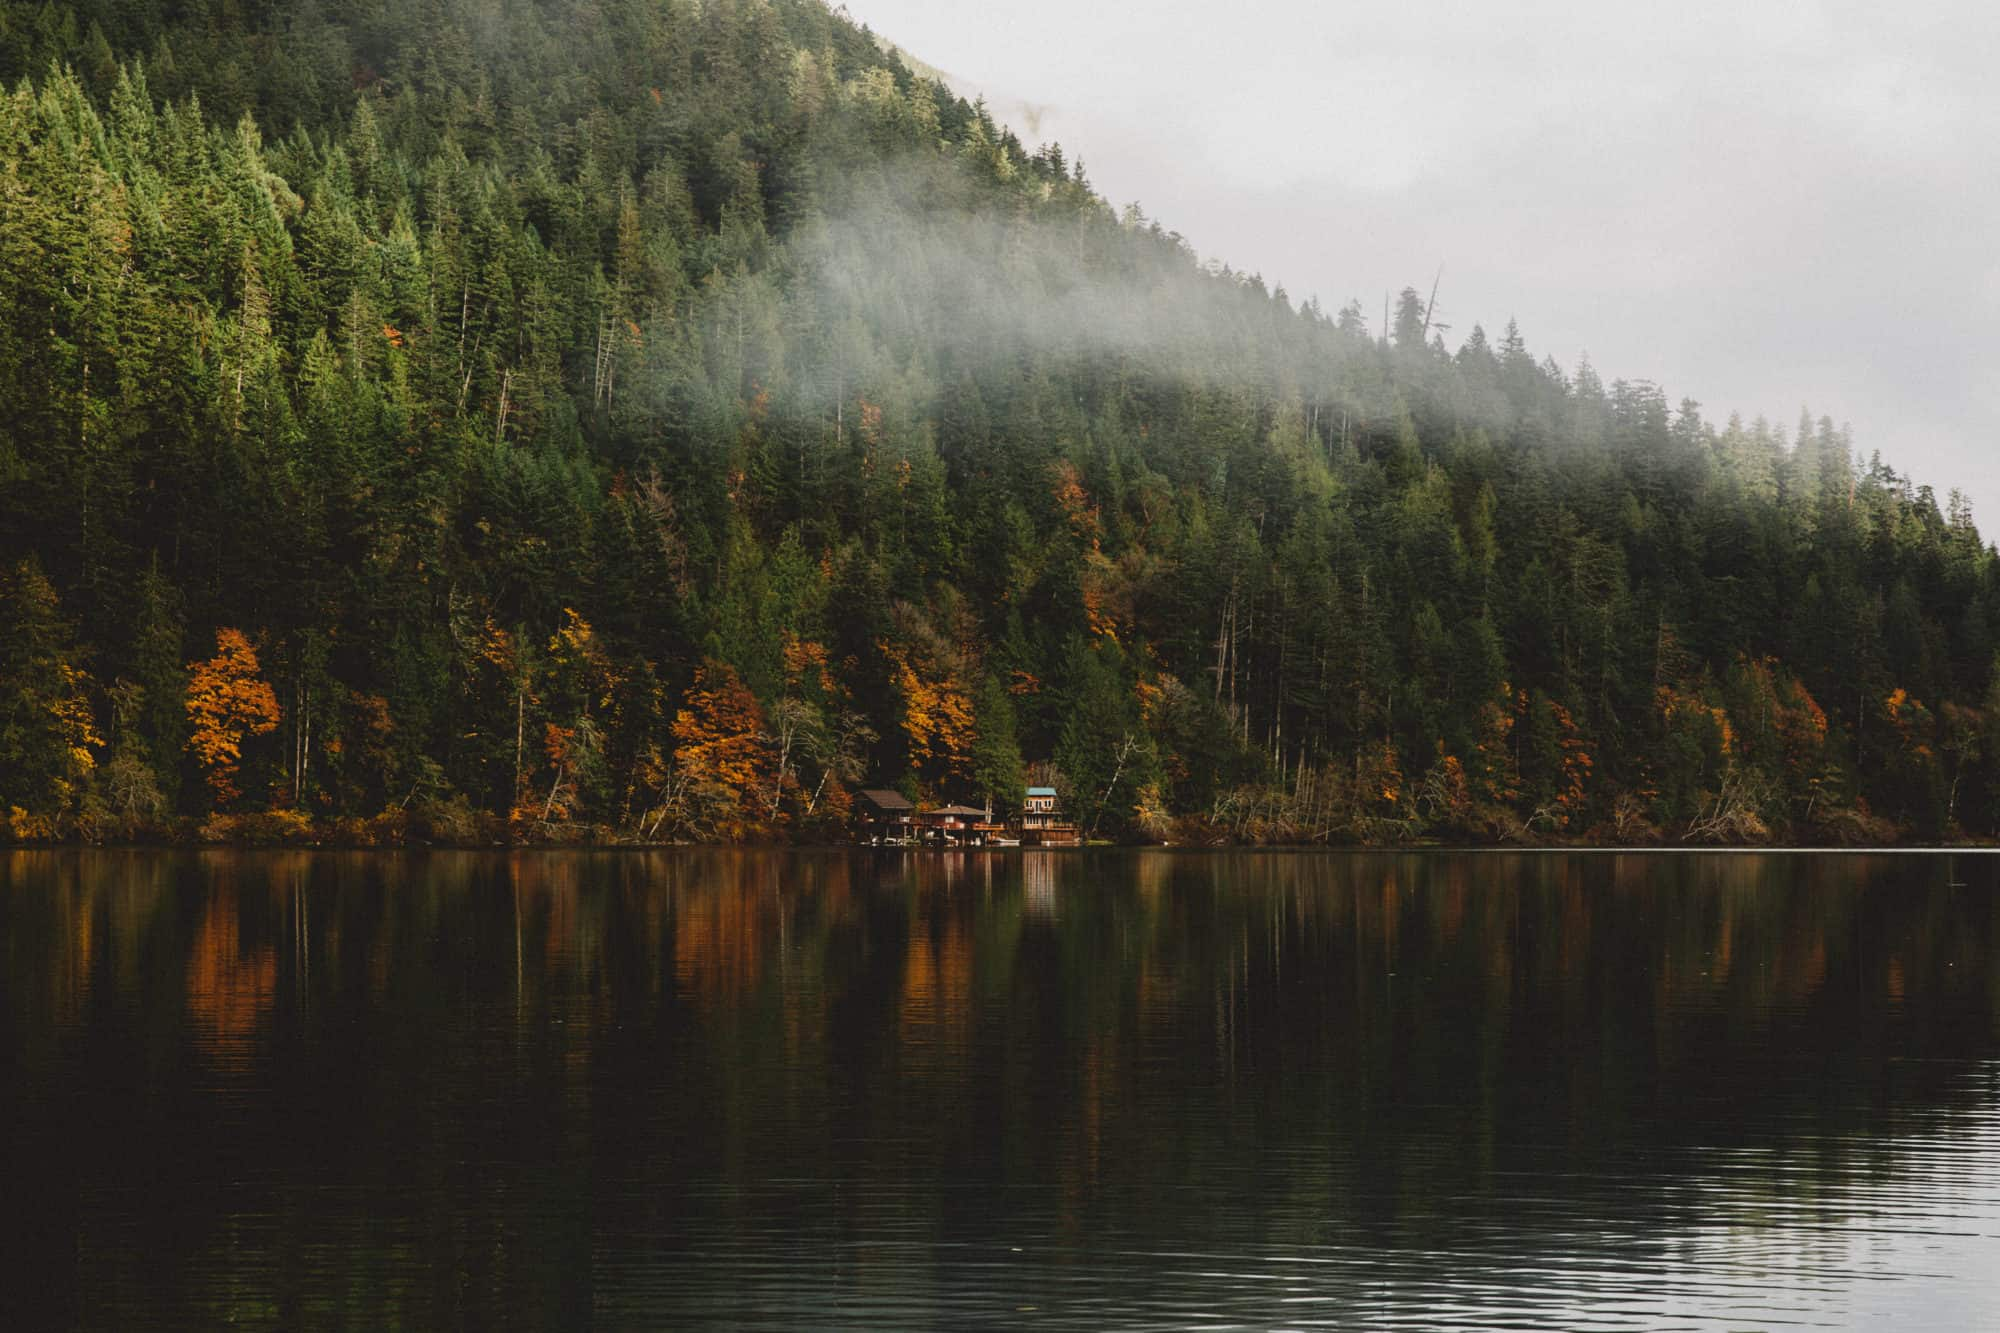 Autumn Season at Lake, Cresent, Olympic Peninsula Road Trip - TheMandagies.com